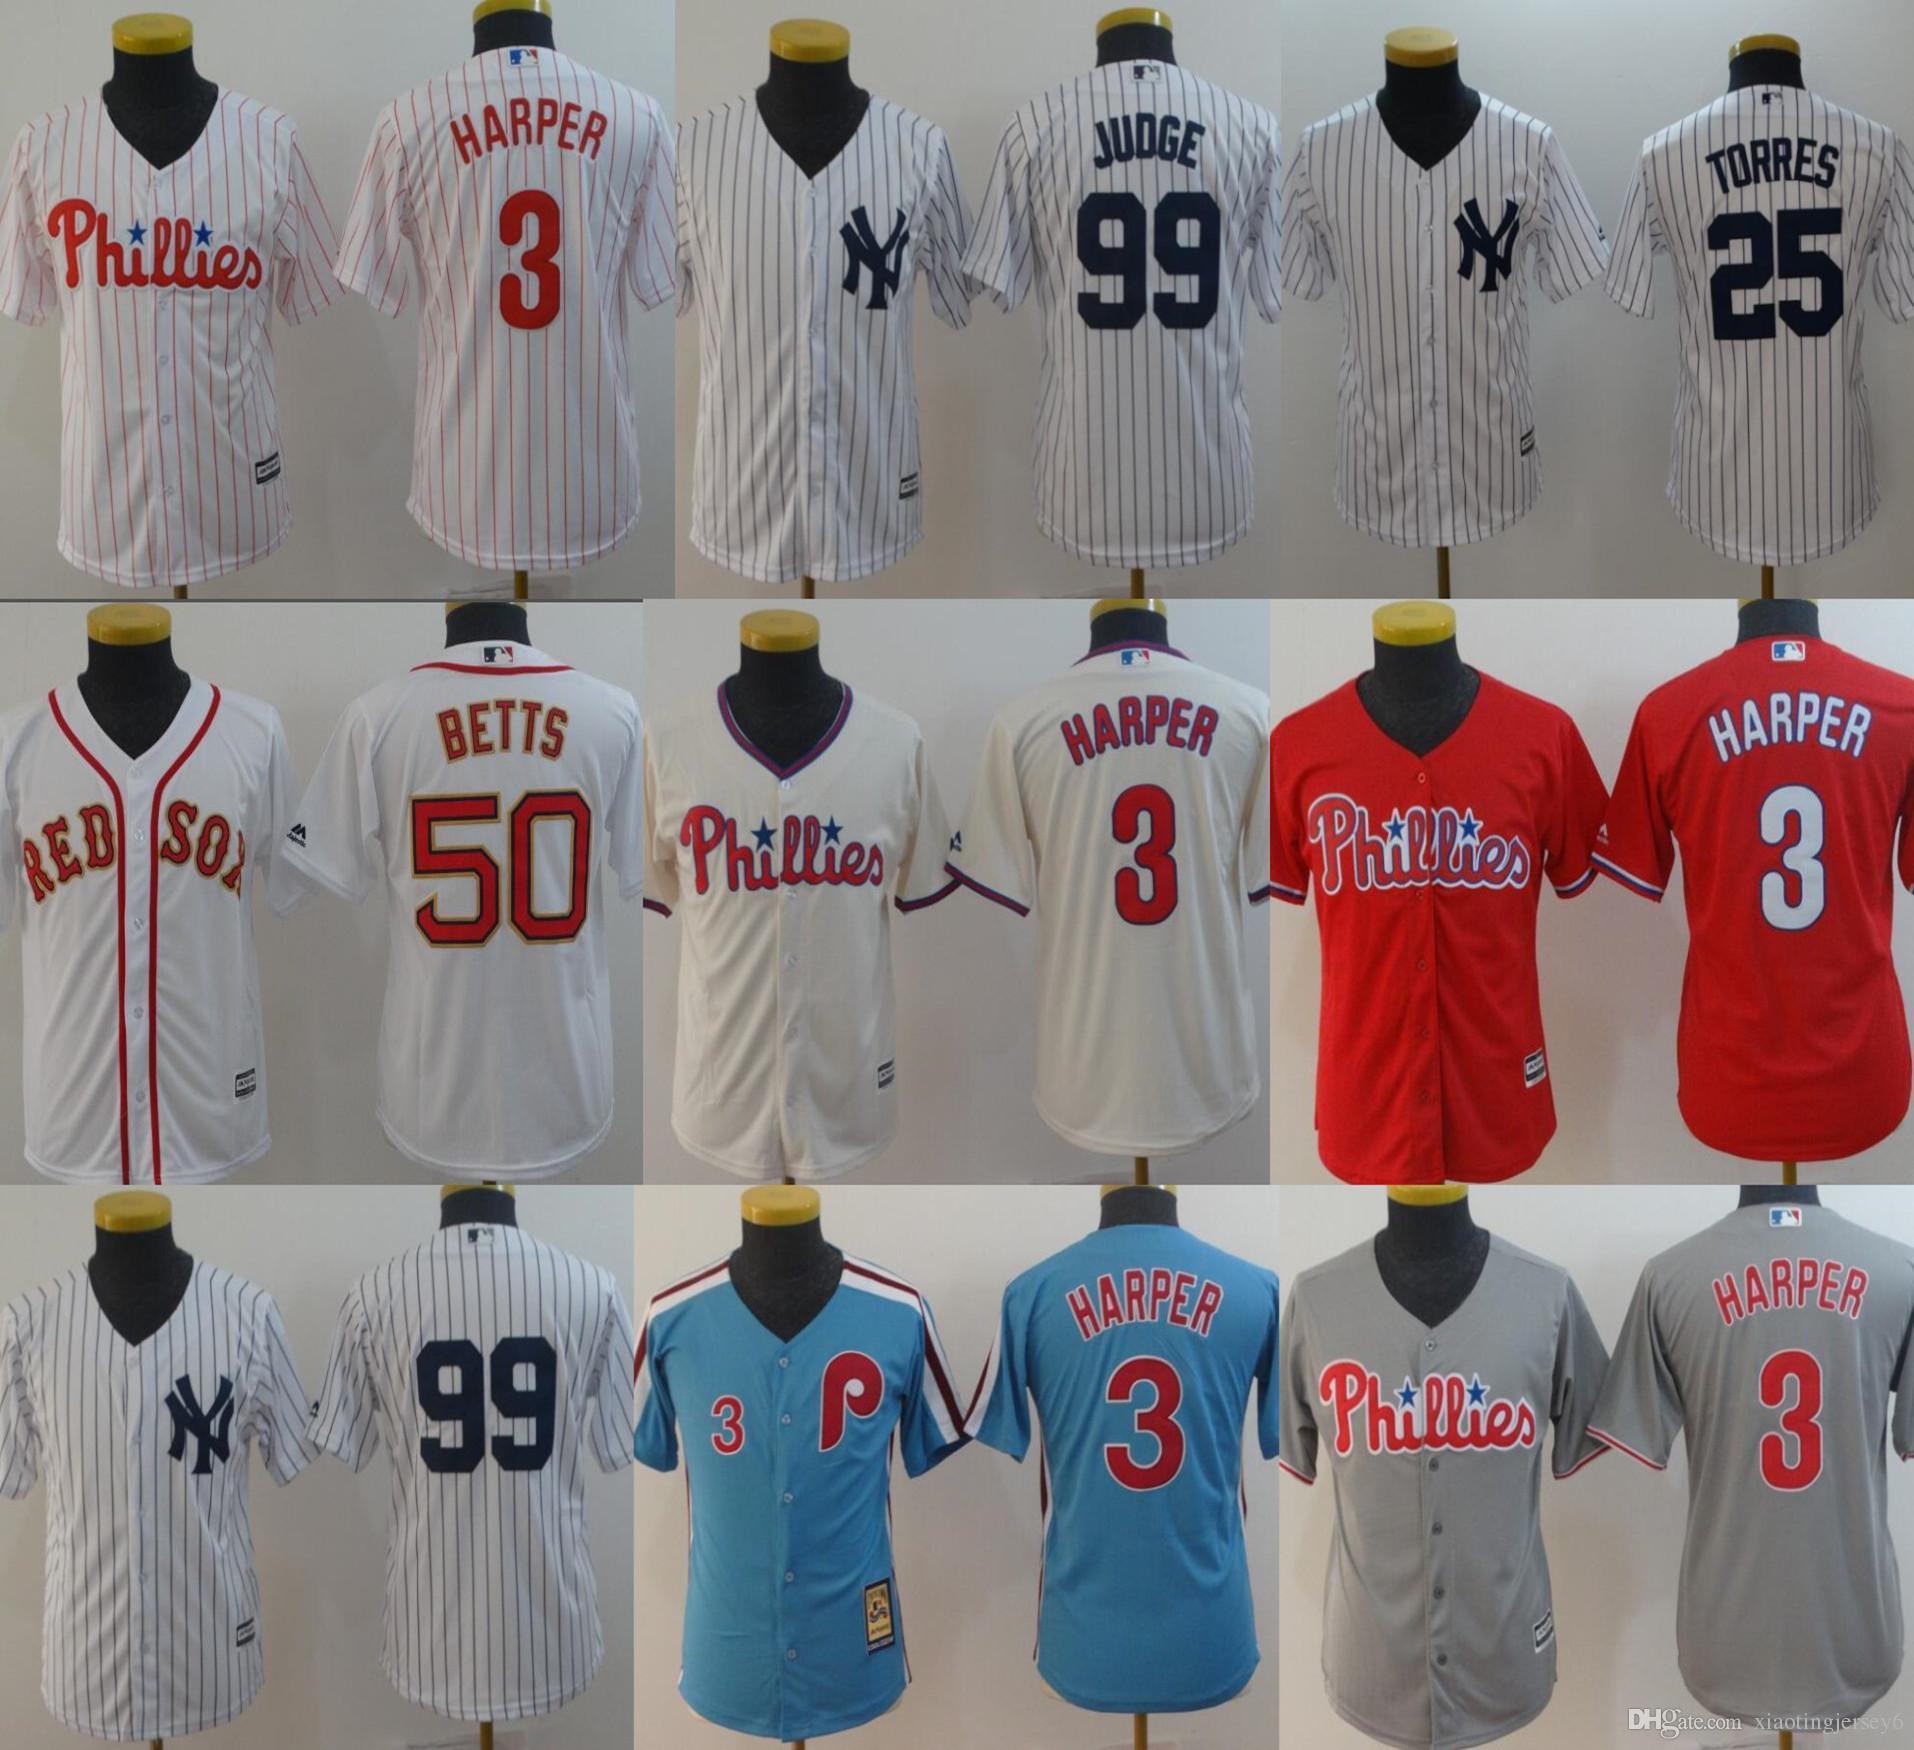 new products 0f514 41377 Boston Jerseys Red Sox 50 Mookie Betts 3 Bryce Harper 99 Aaron Judge 25  Torres Philadelphia Youth Kids Baseball Jerseys Size: S-XL